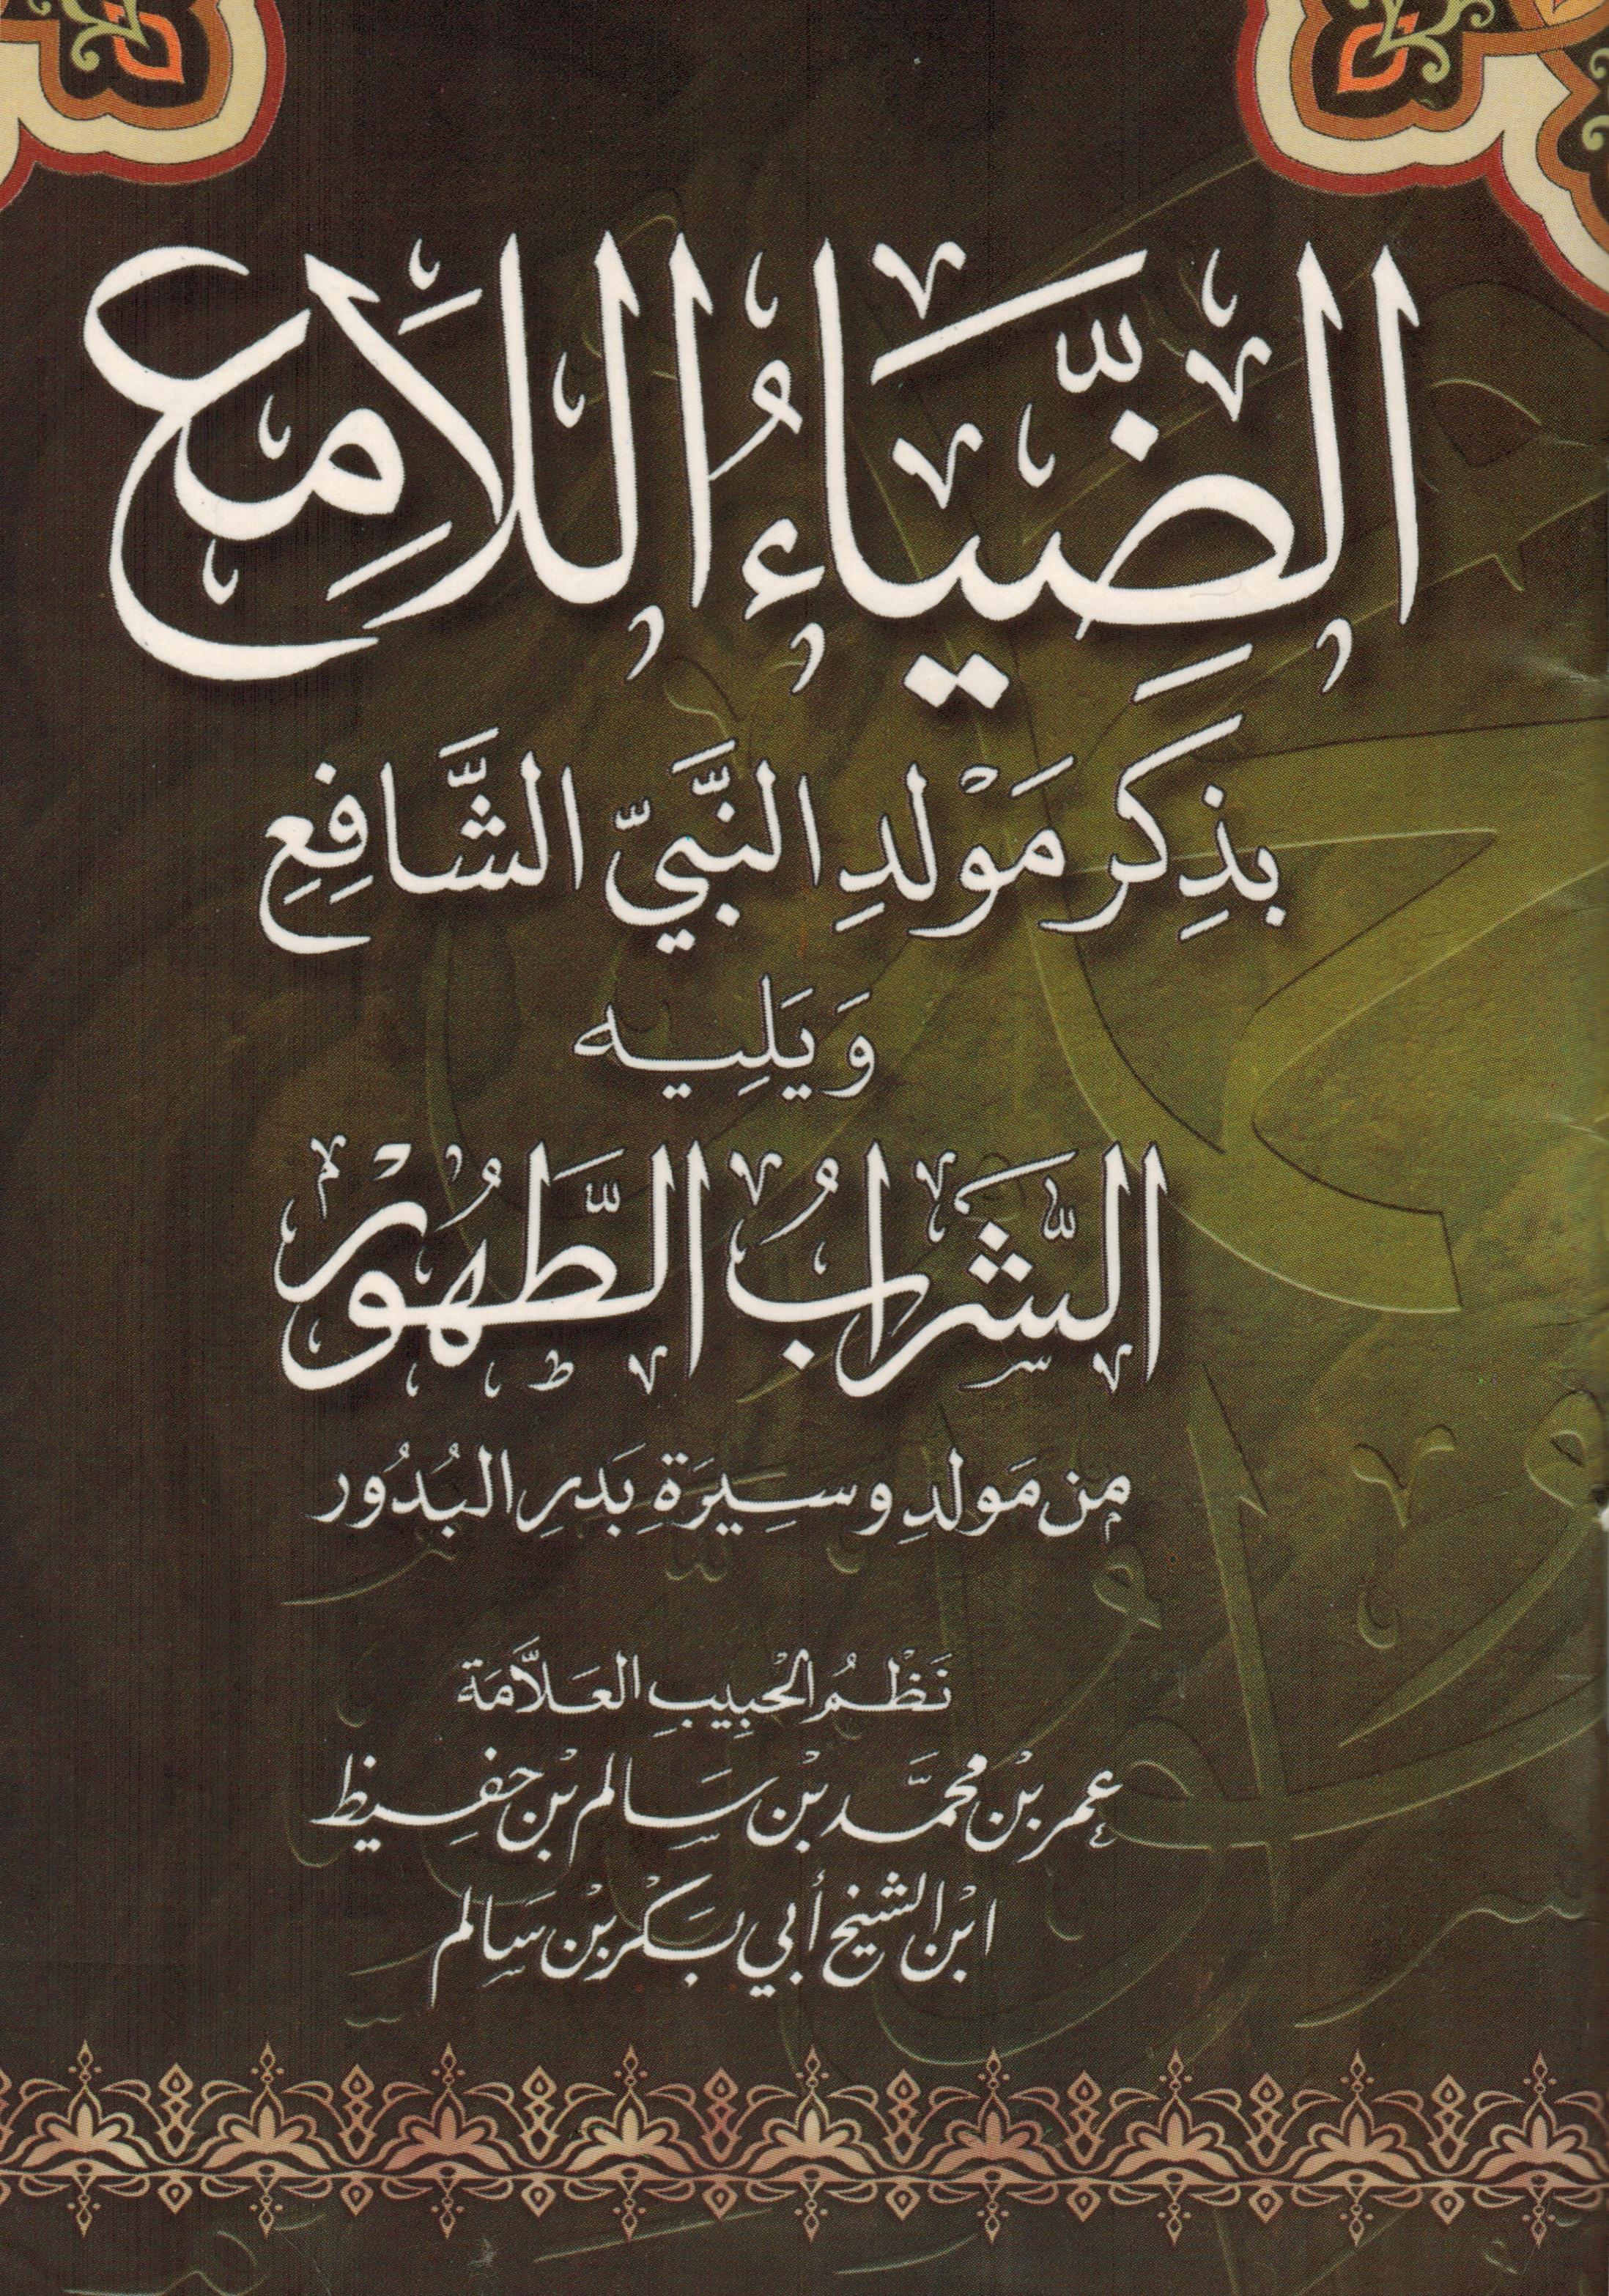 Habib Omar Mawlid.jpeg